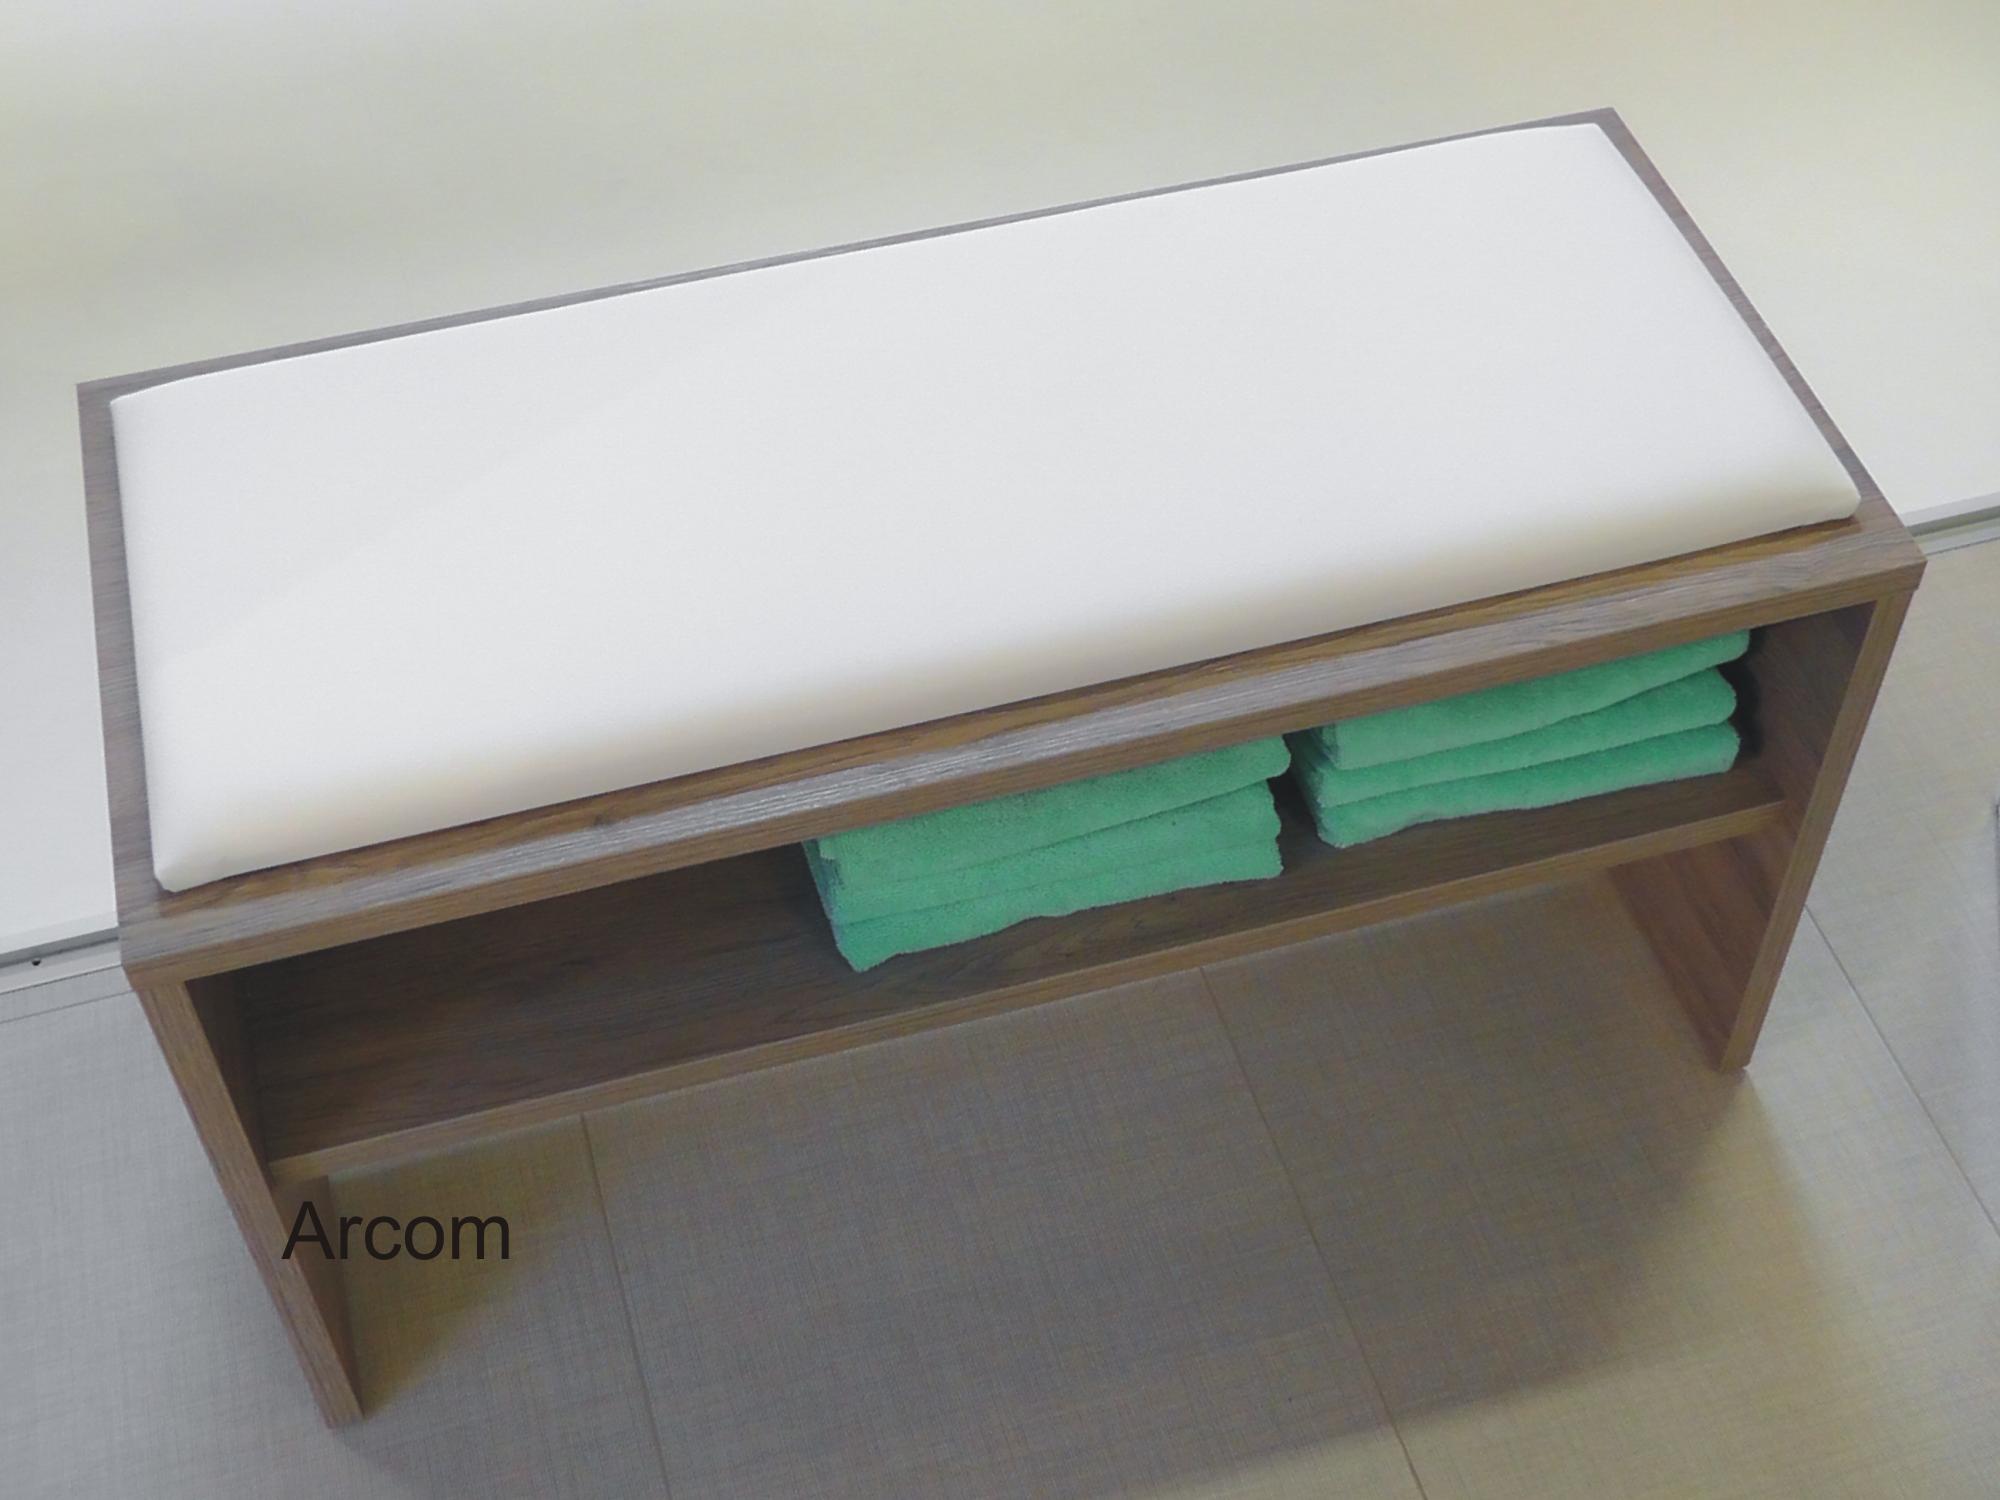 pelipal solitaire 7020 hochschrank 30 cm arcom center. Black Bedroom Furniture Sets. Home Design Ideas